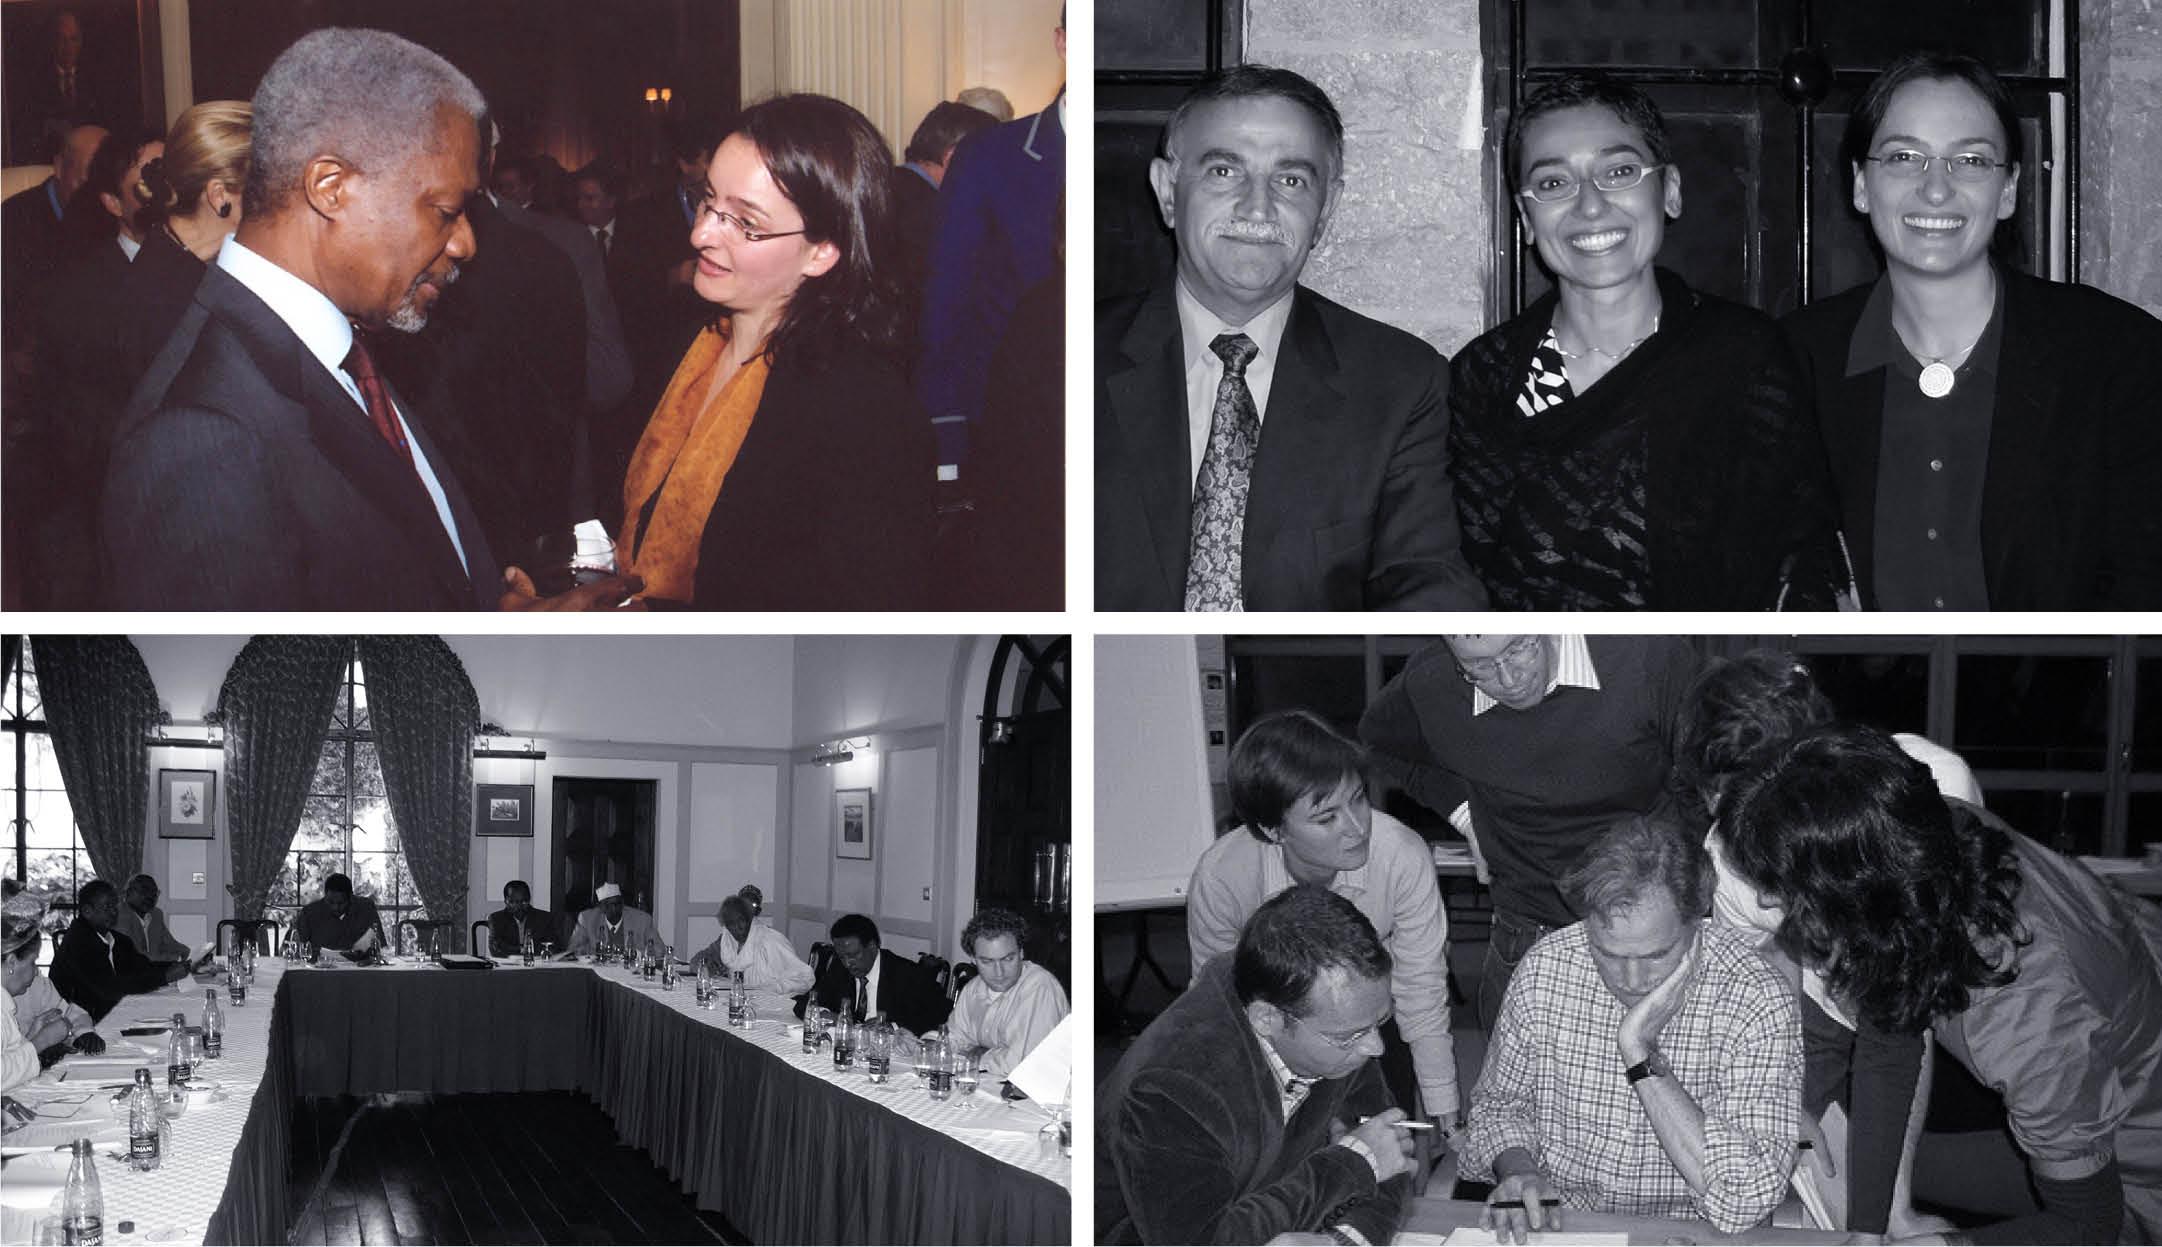 UN Secretary General Kofi Annan, NYC, 2004